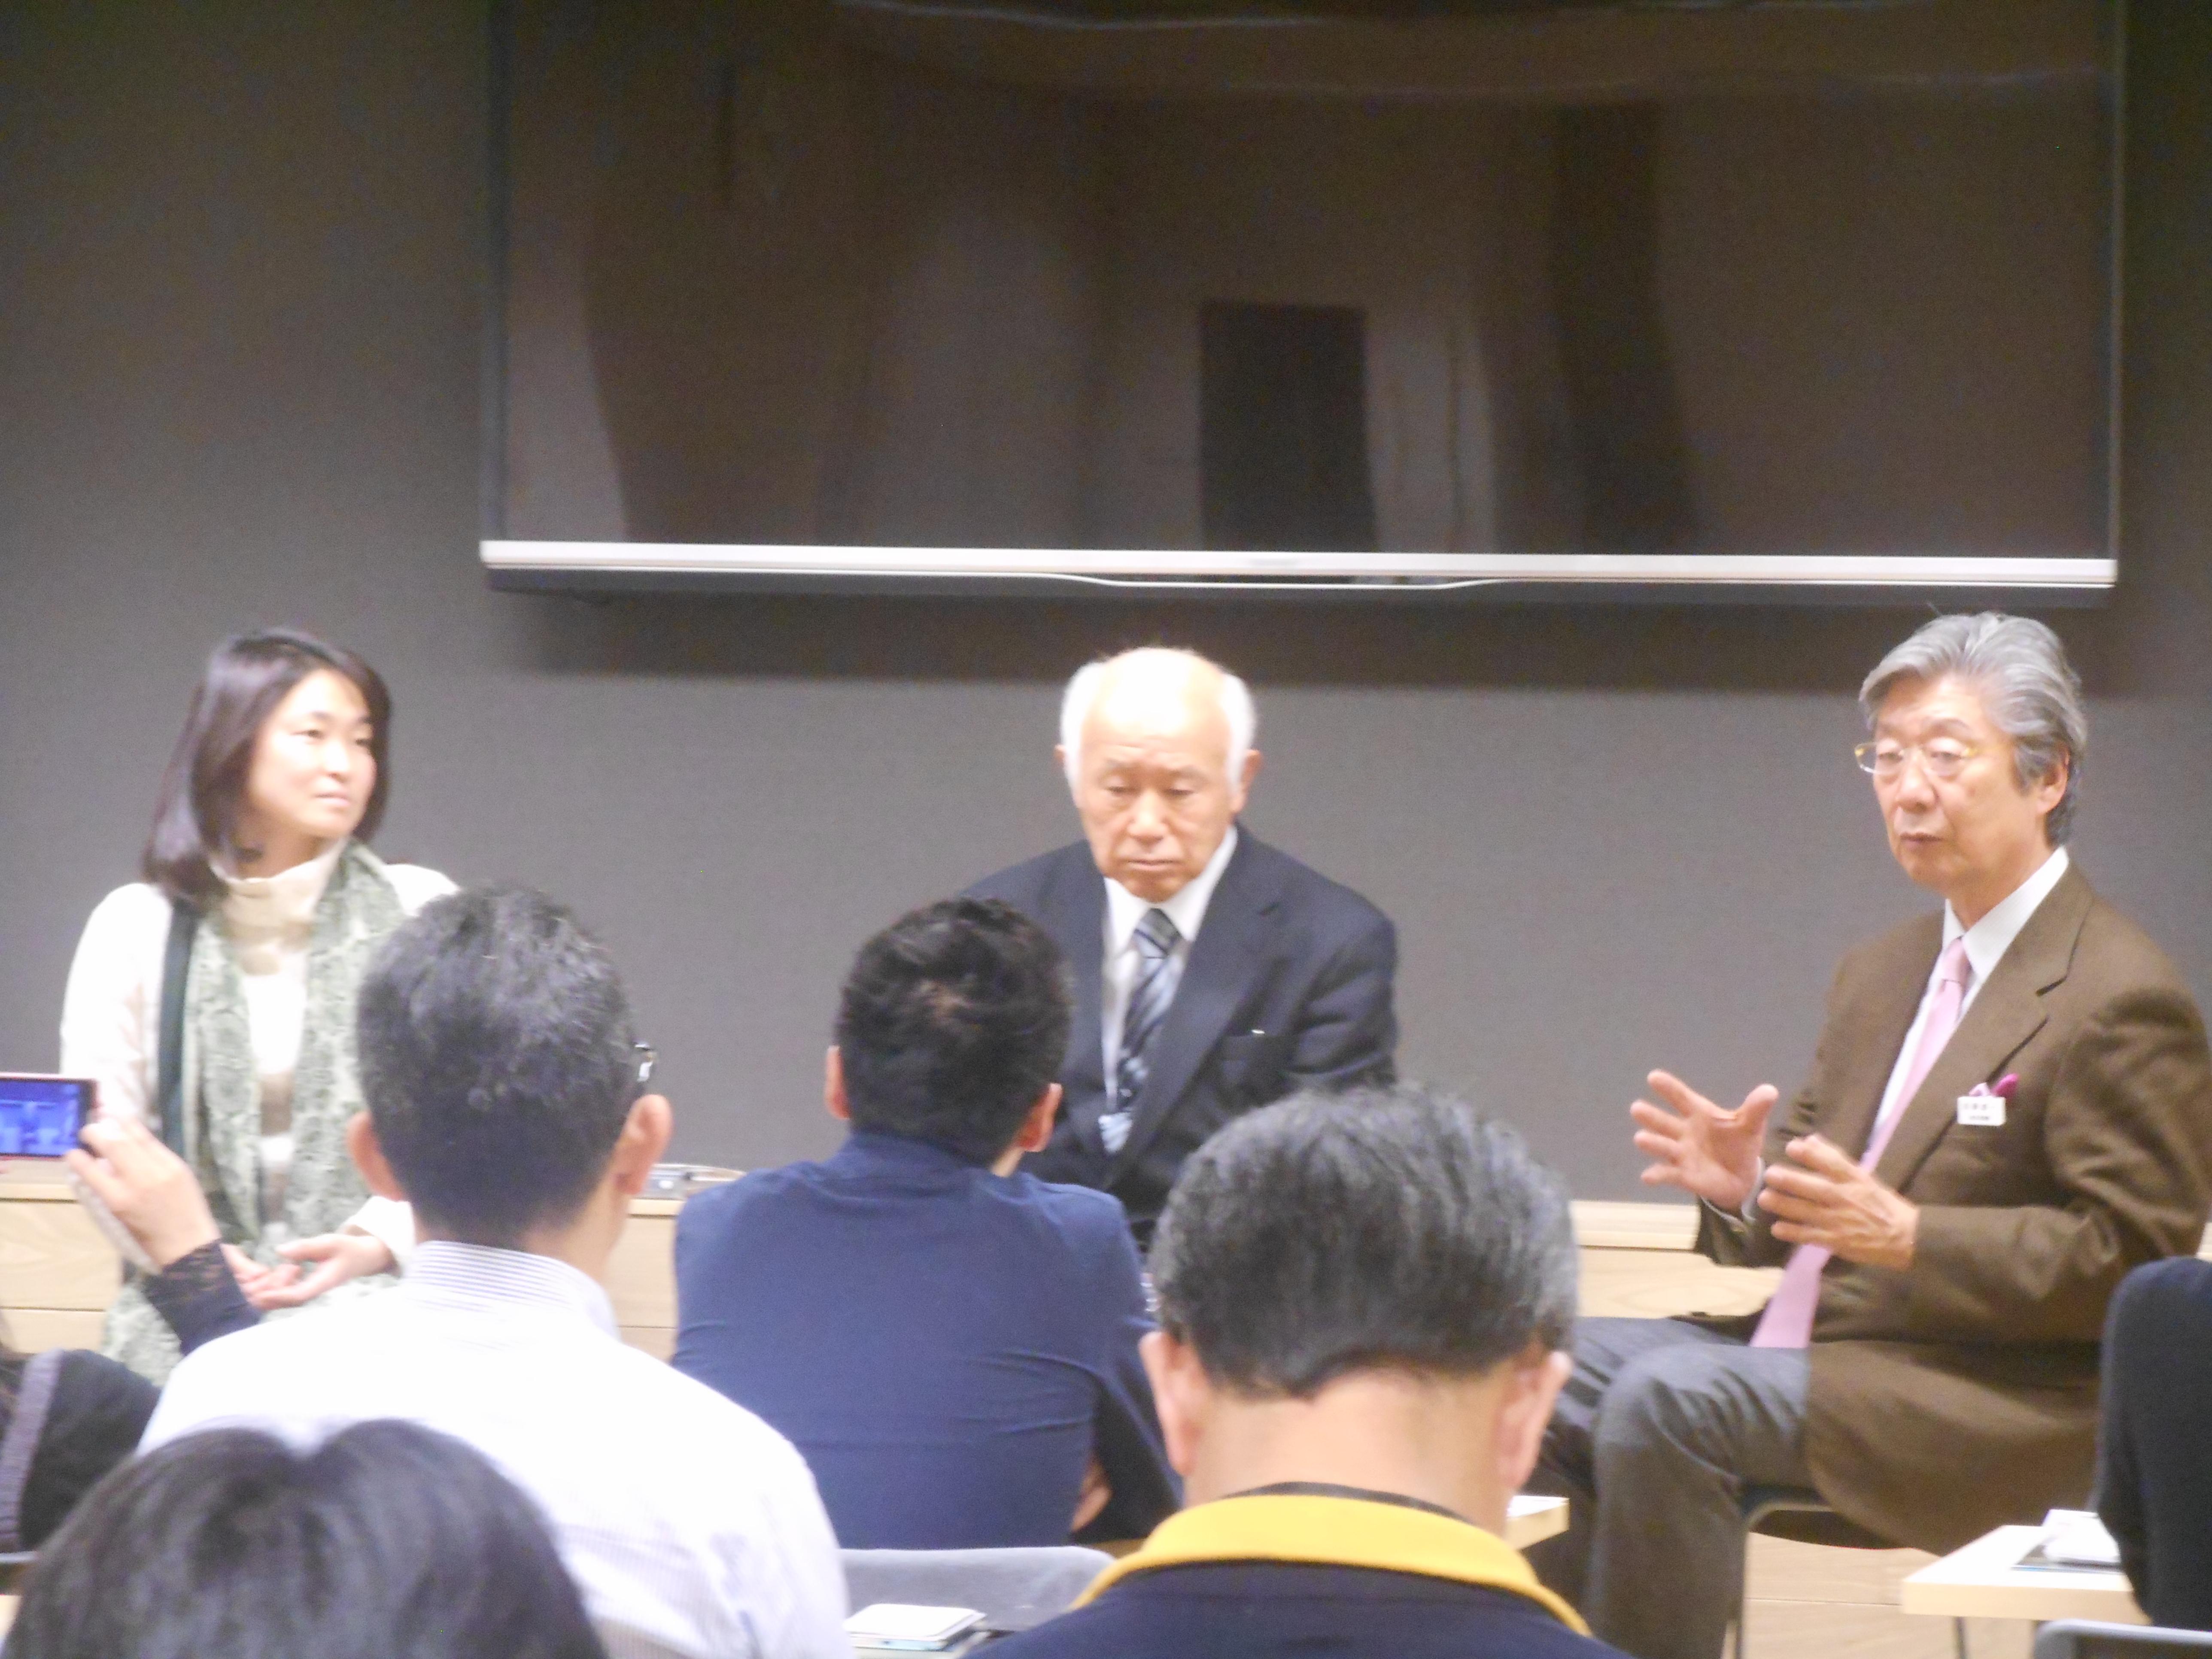 DSCN0469 - 2017年2月4日東京思風塾開催